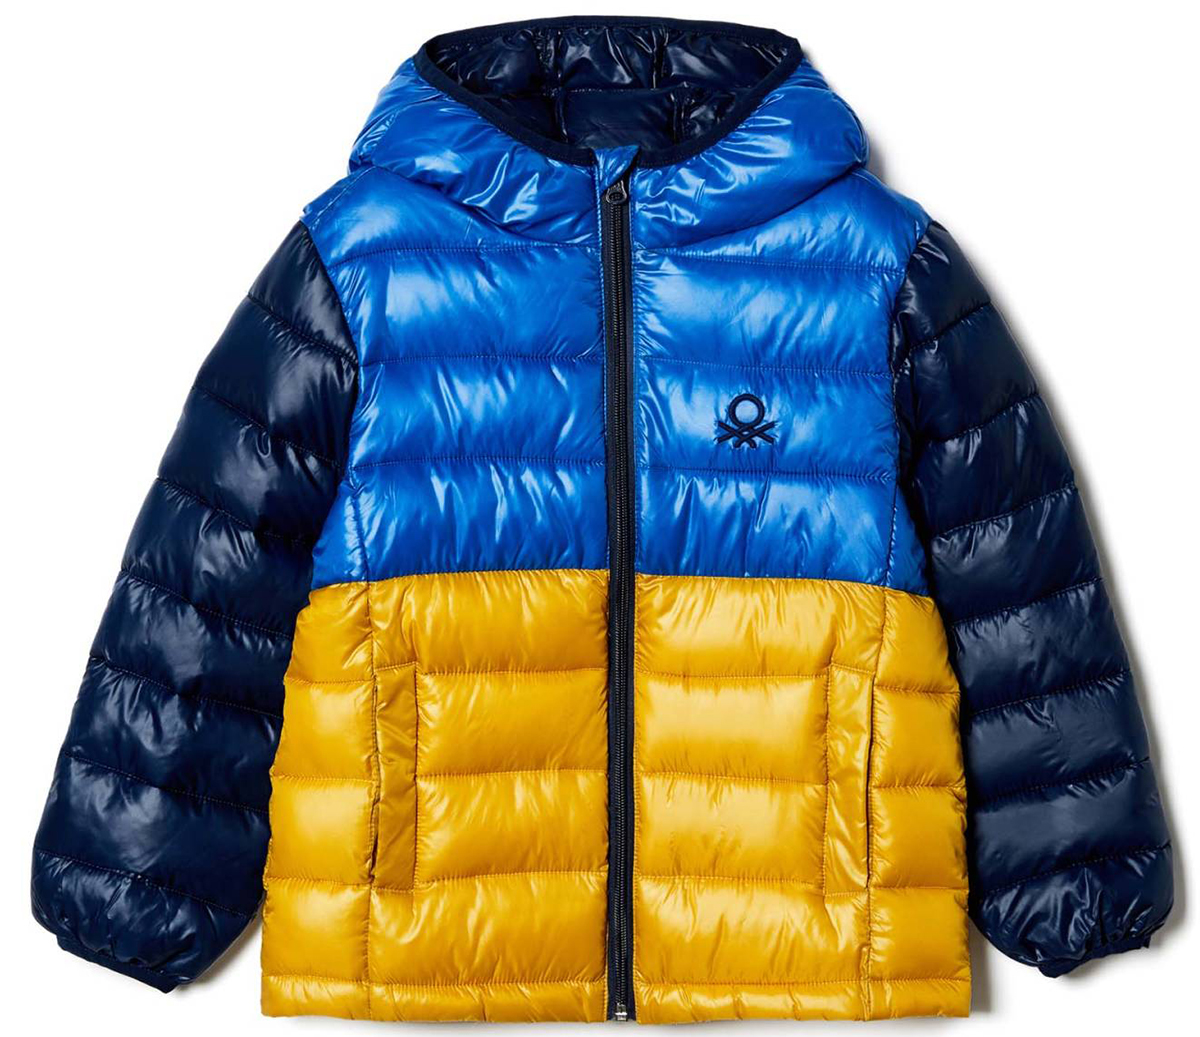 Куртка для мальчиков United Colors of Benetton, цвет: синий, желтый. 2GK4539T0_33M. Размер 1302GK4539T0_33M